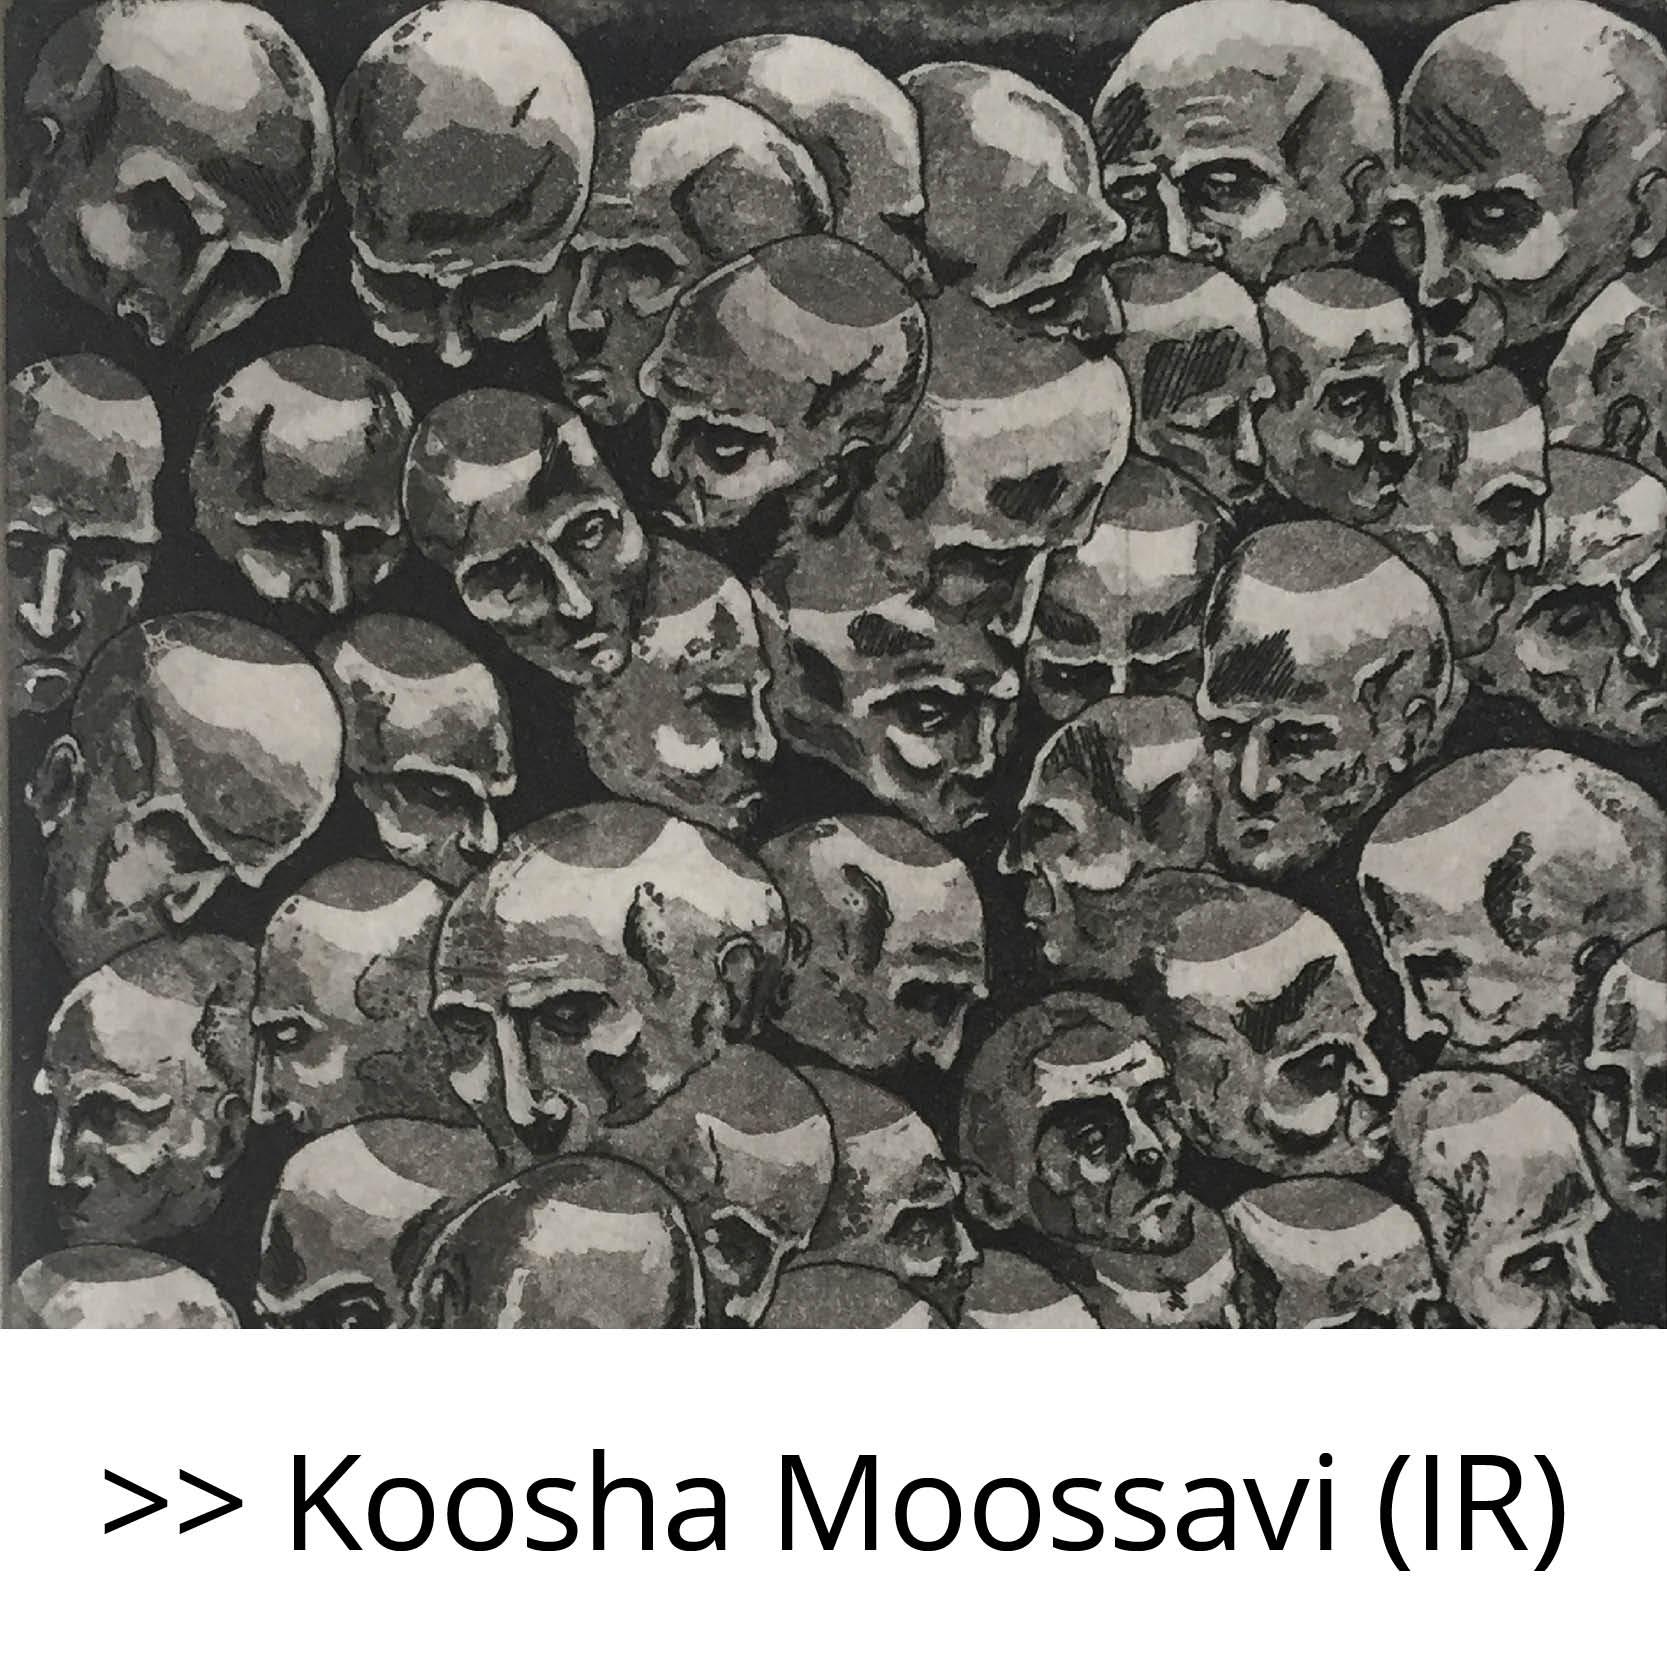 Koosha_Moossavi_(IR)